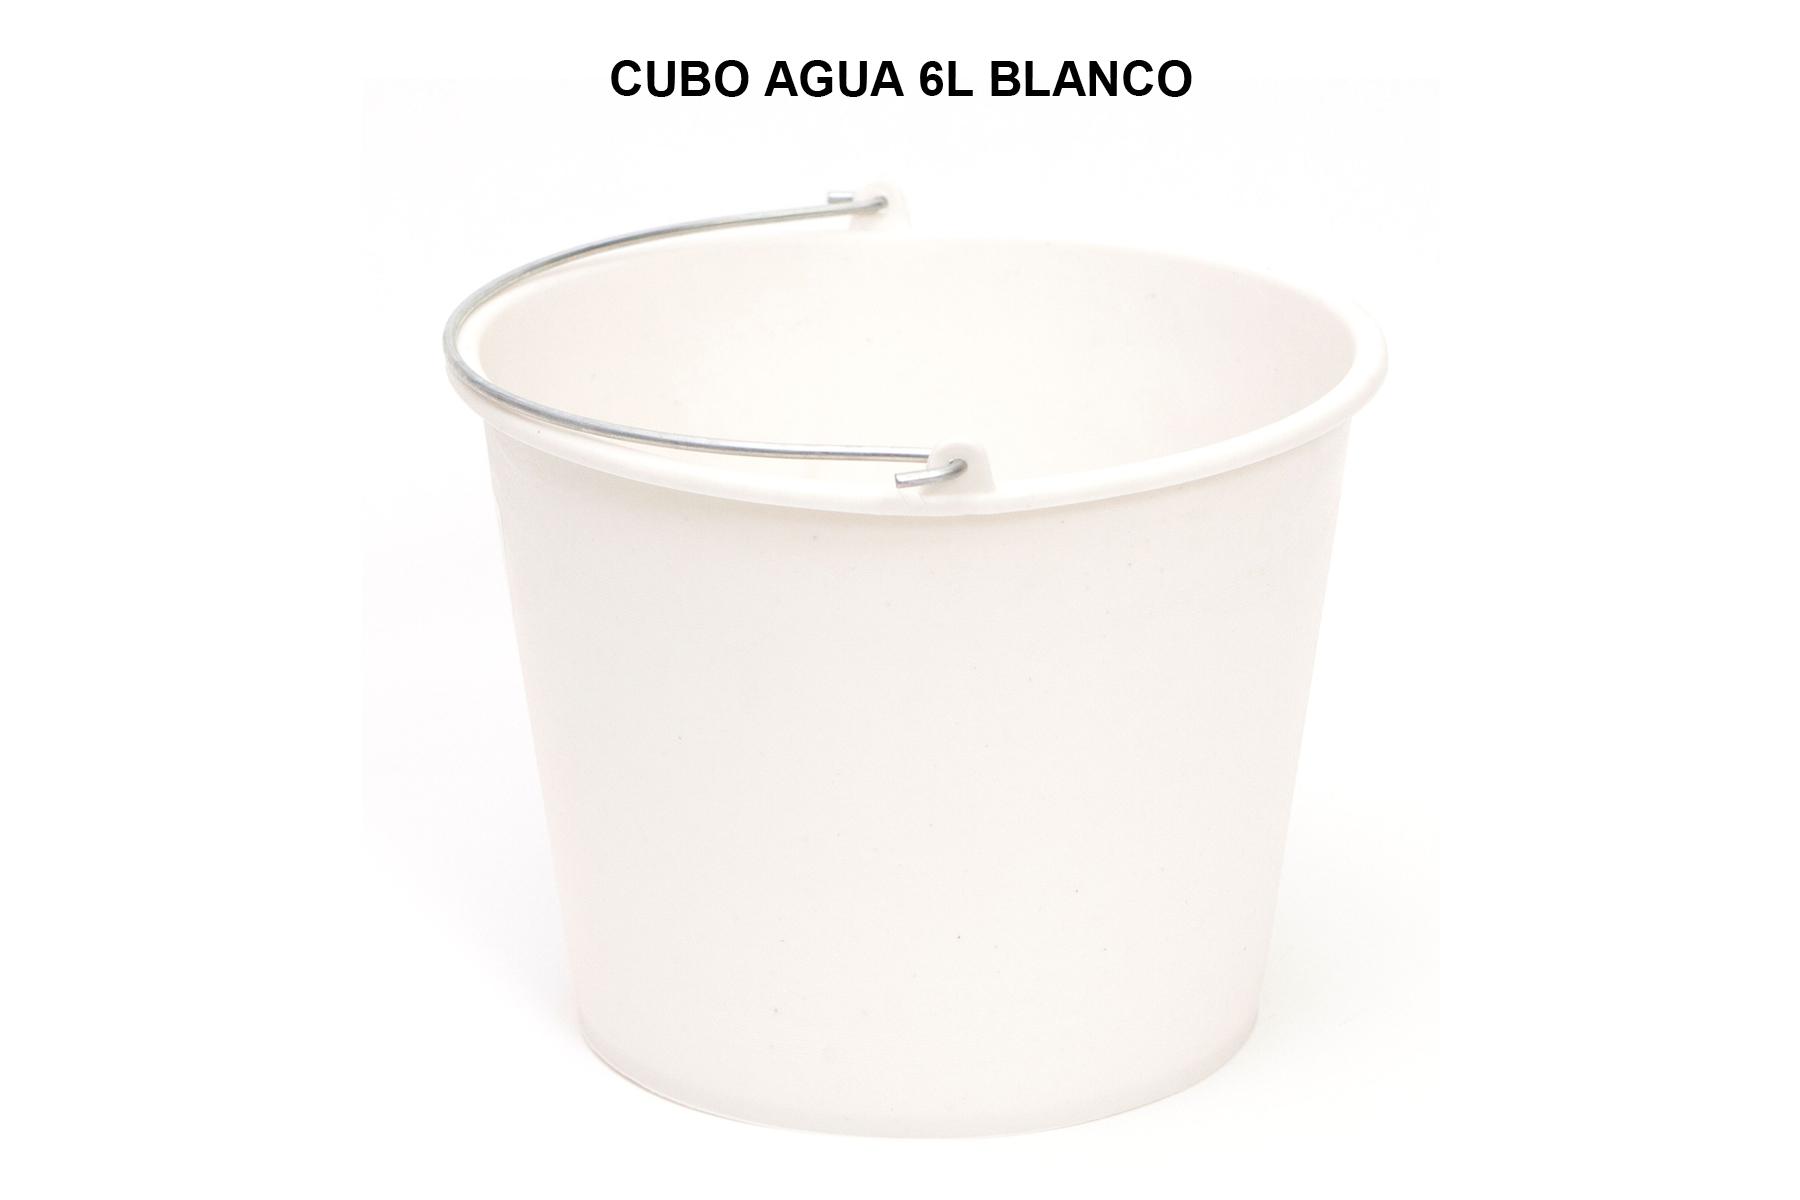 CUBO 6L BLANCO